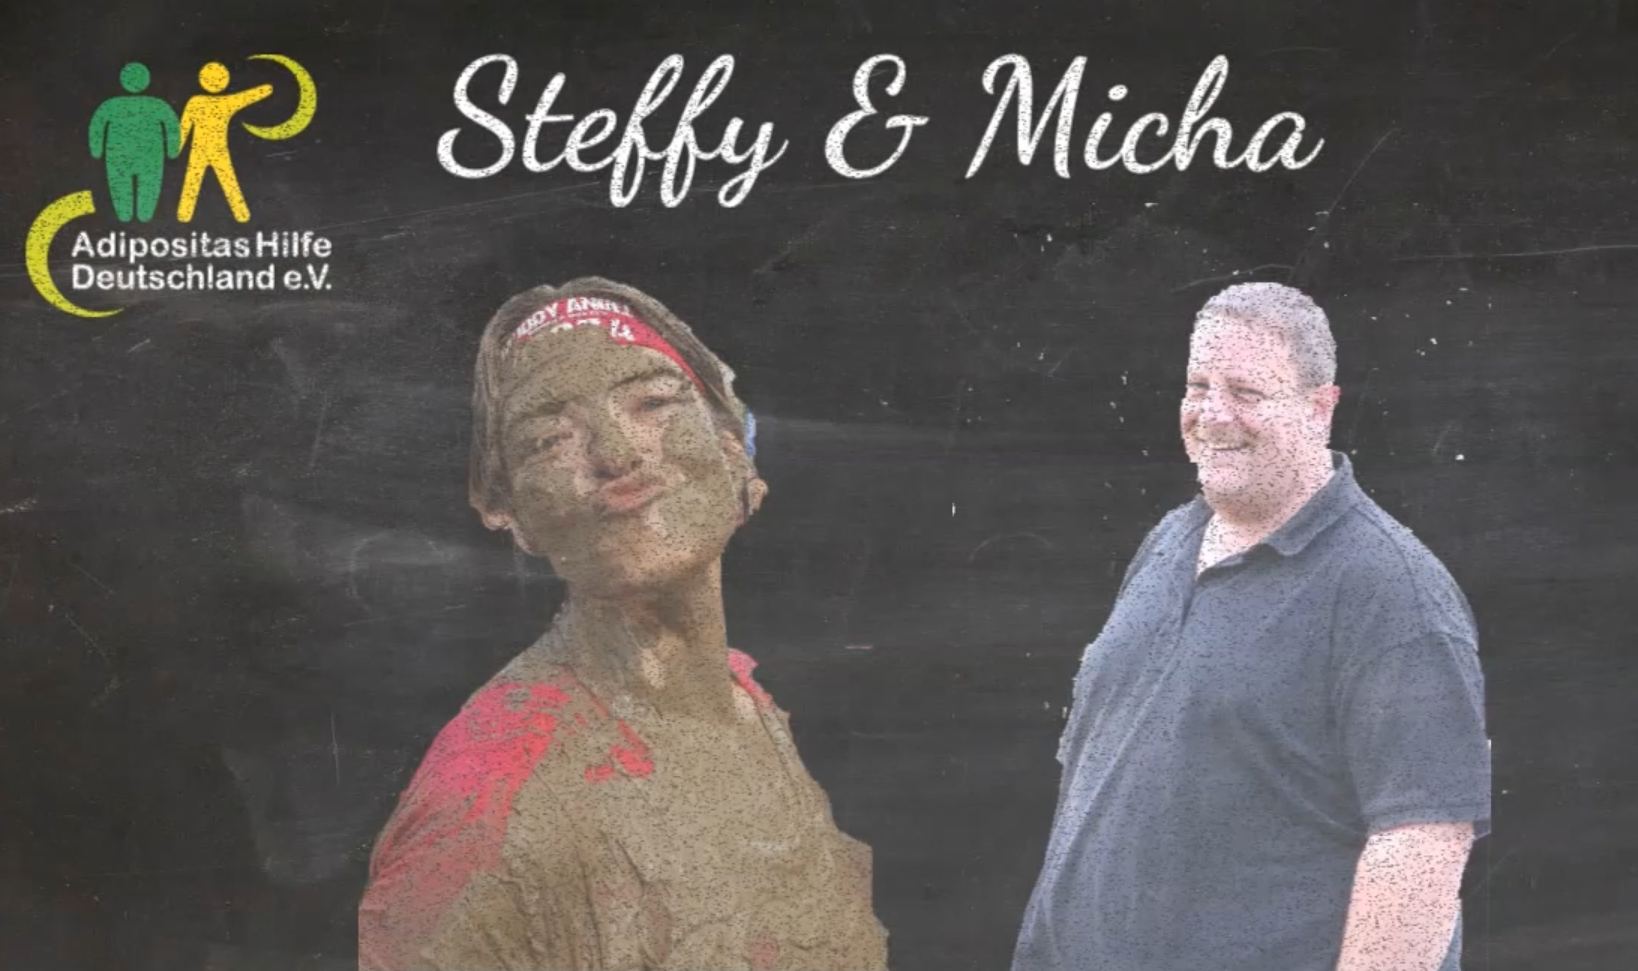 Steffy_Micha_Part2